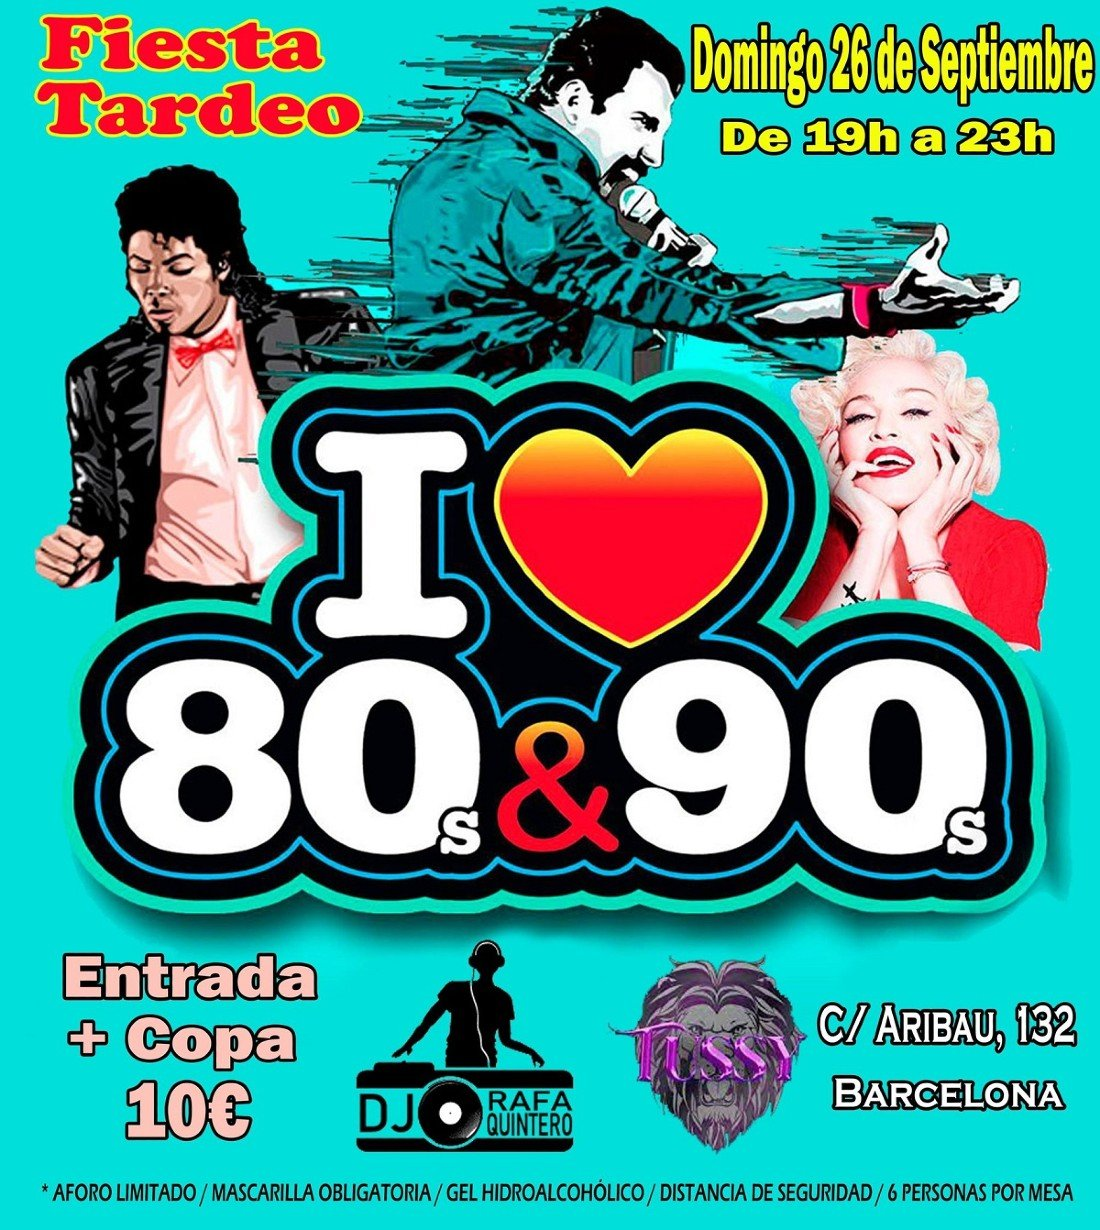 Fiesta Tardeo I Love 80s&90s